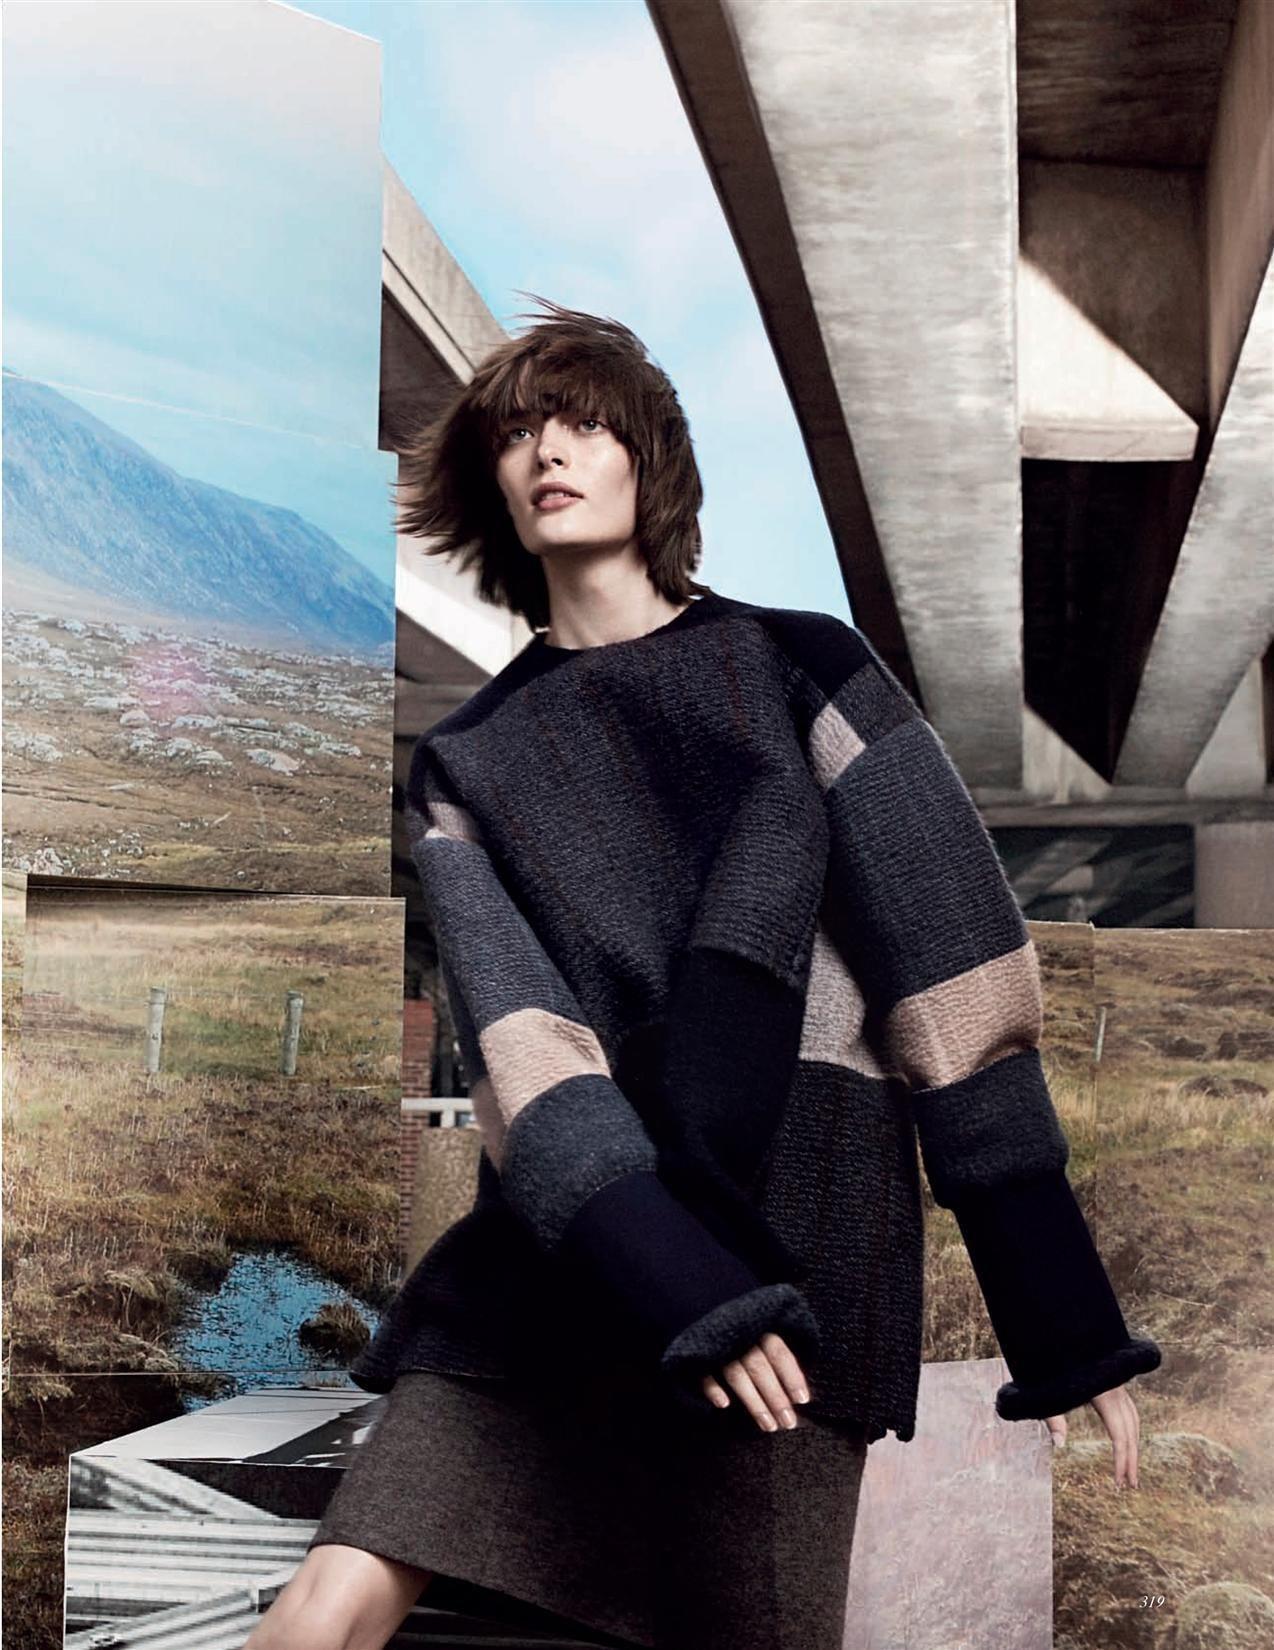 Art Commerce Artists Photographers Craig Mcdean Editorial Vogue Uk Craig Mcdean Editorial Fashion